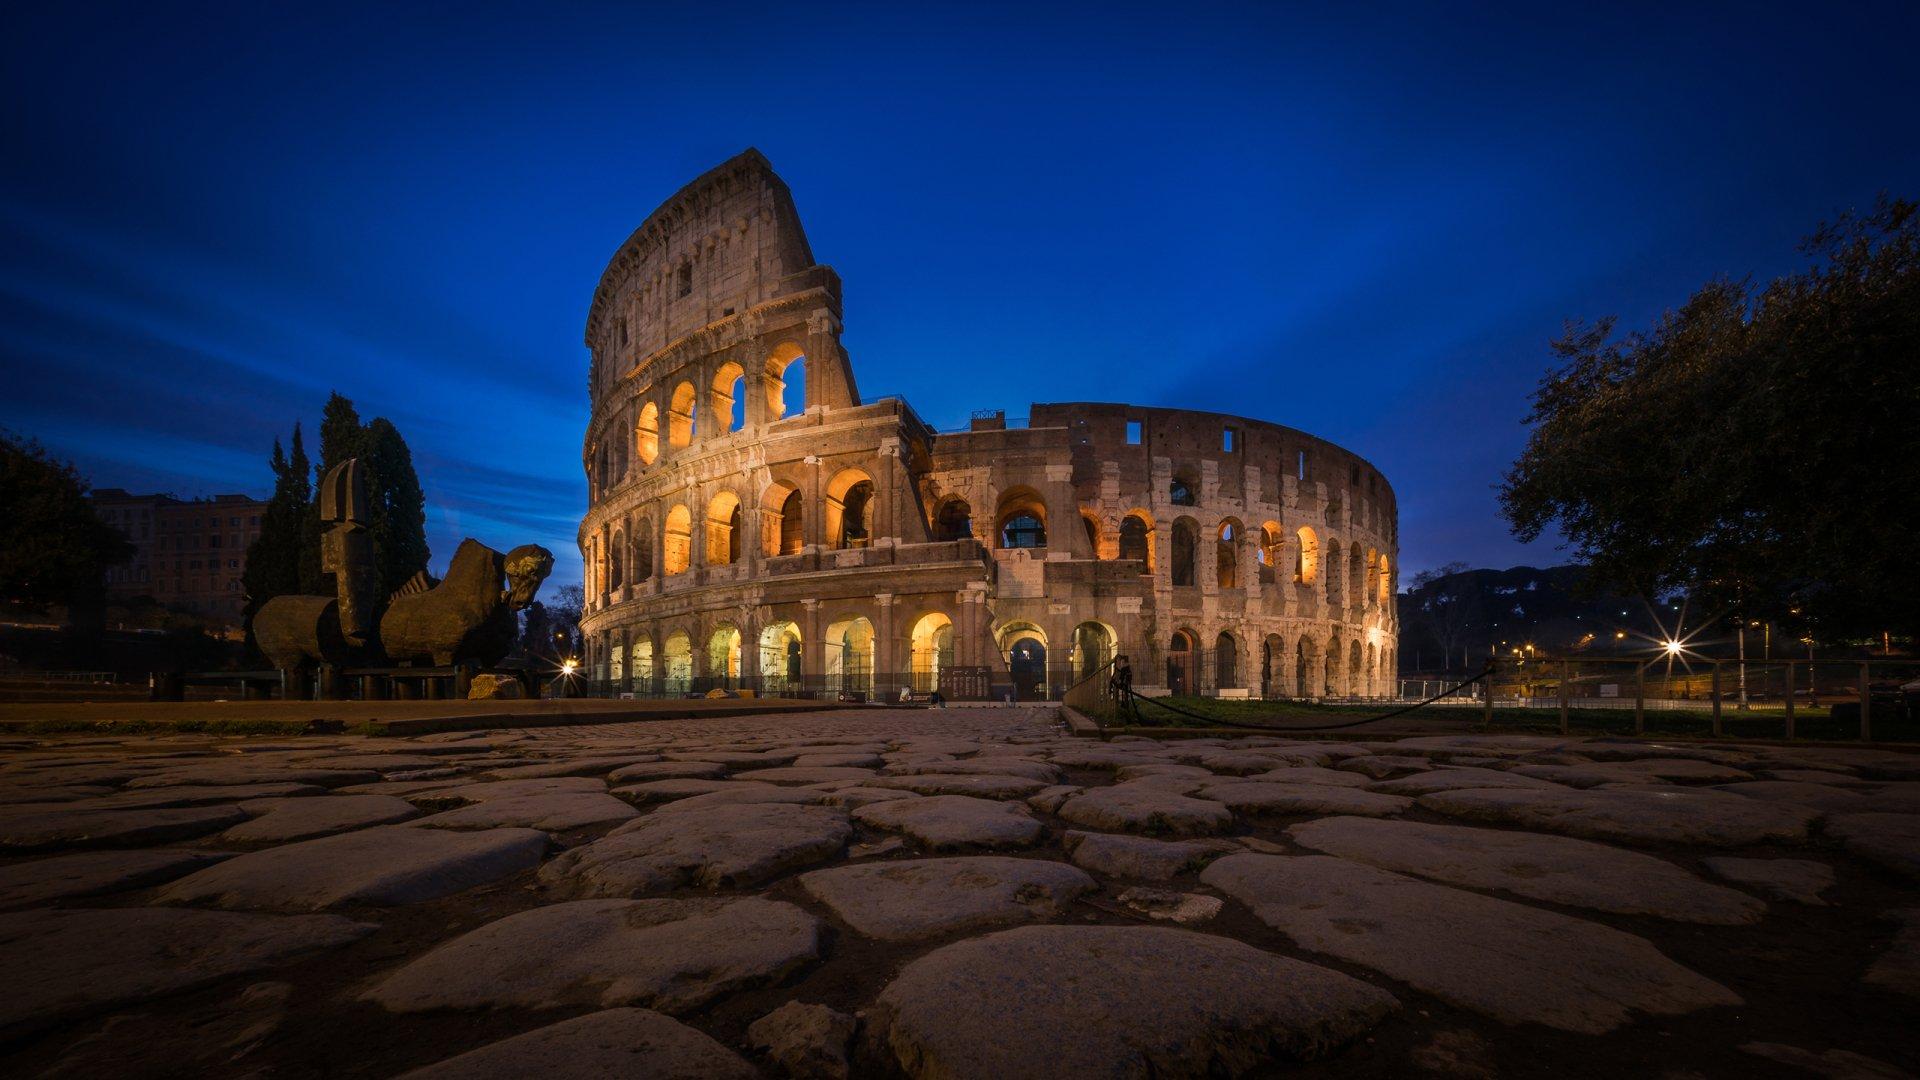 stones Colosseum Wallpaper